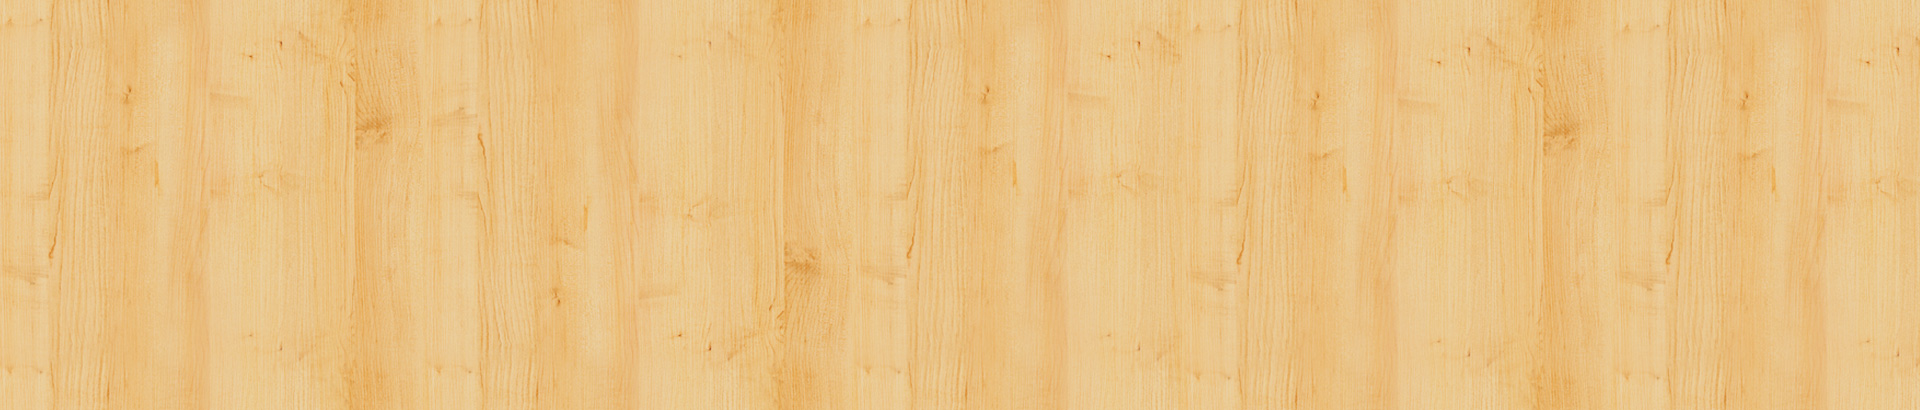 woodslide1